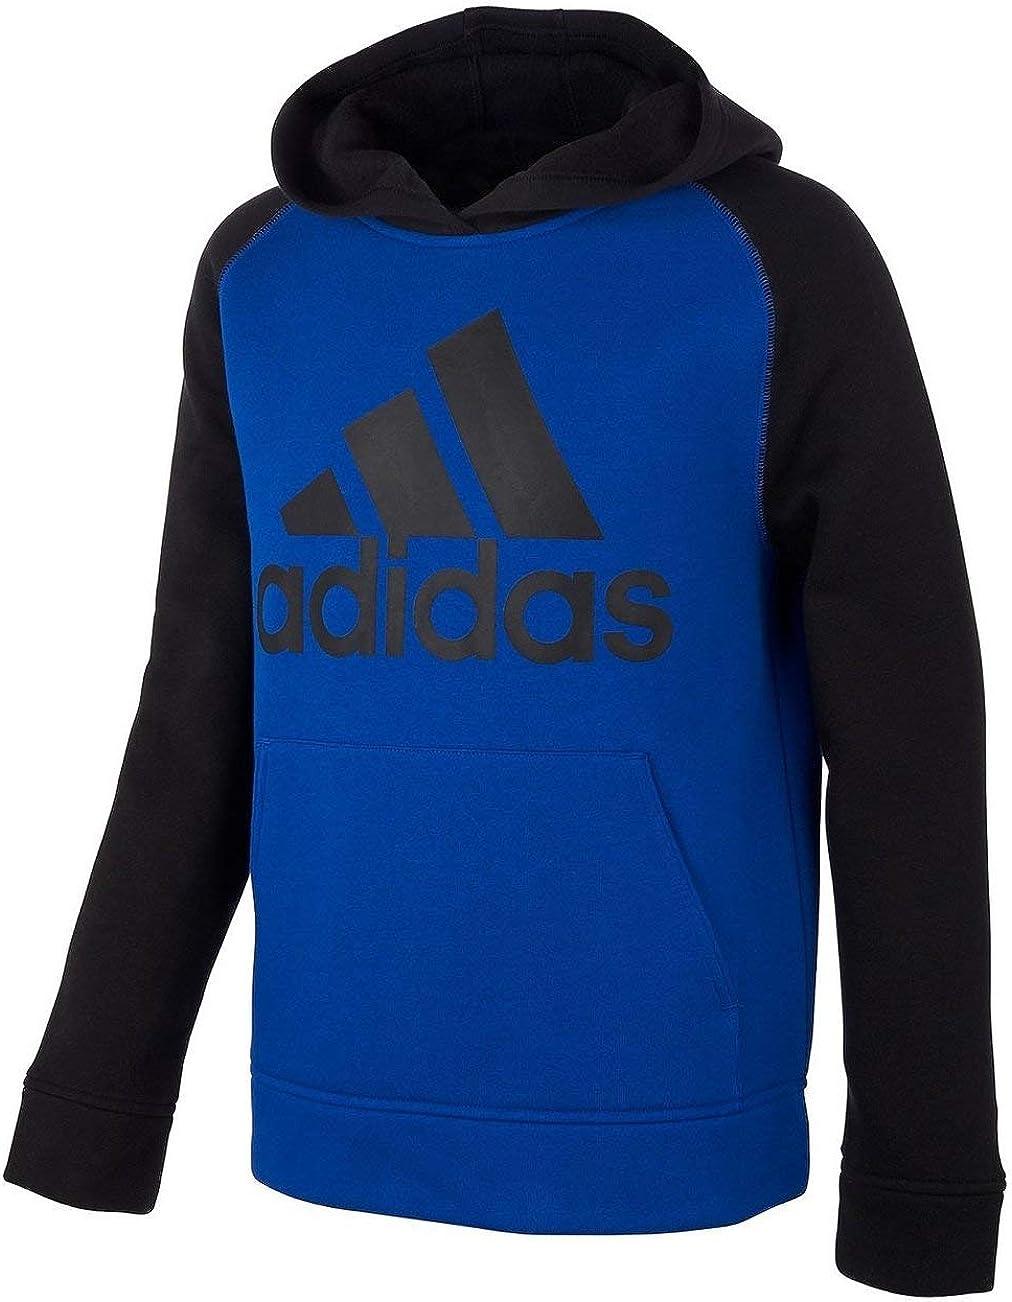 adidas Big Boys Colorblocked Fleece Hoodie Size S(8) Blue/Black